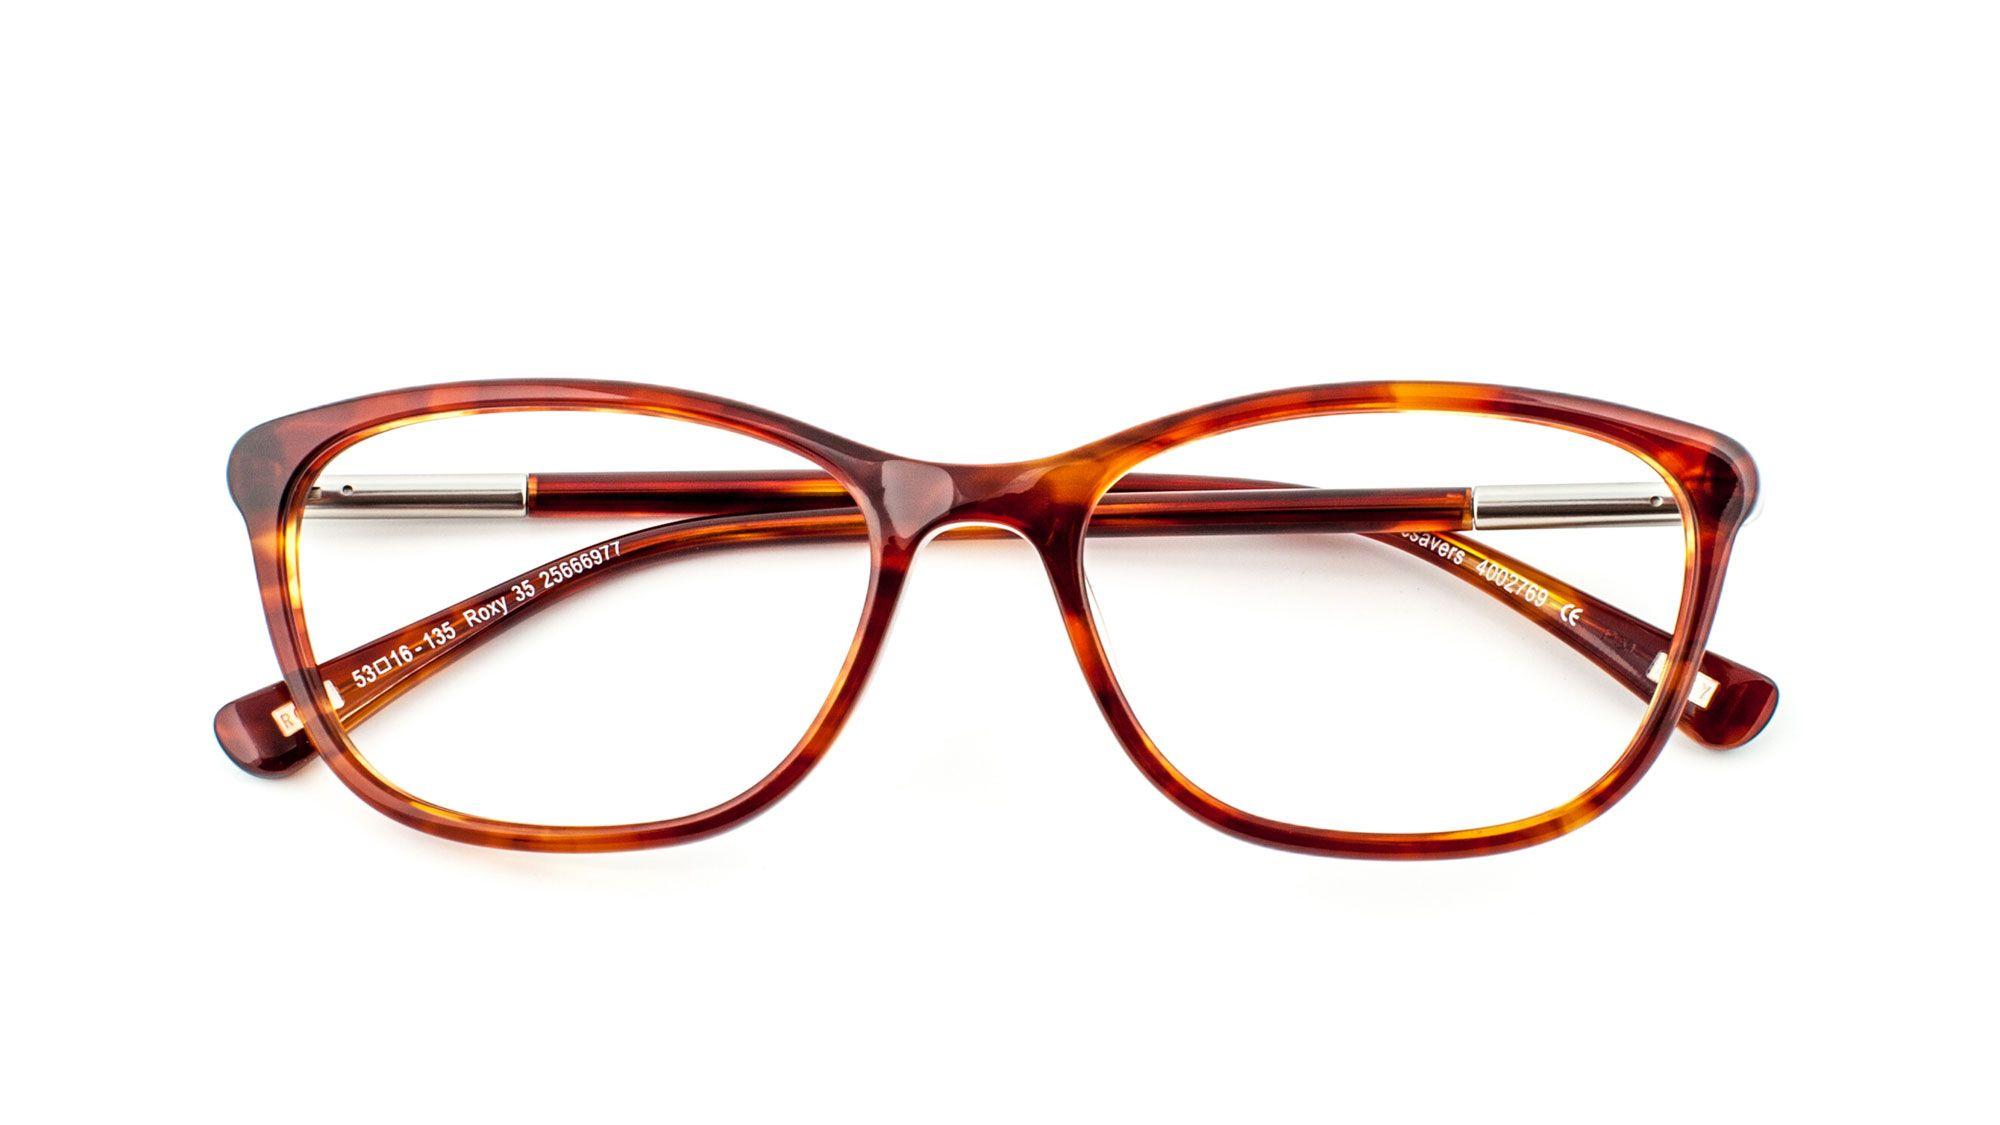 Roxy glasses ROXY 35 Womens glasses, Glasses, Mens glasses